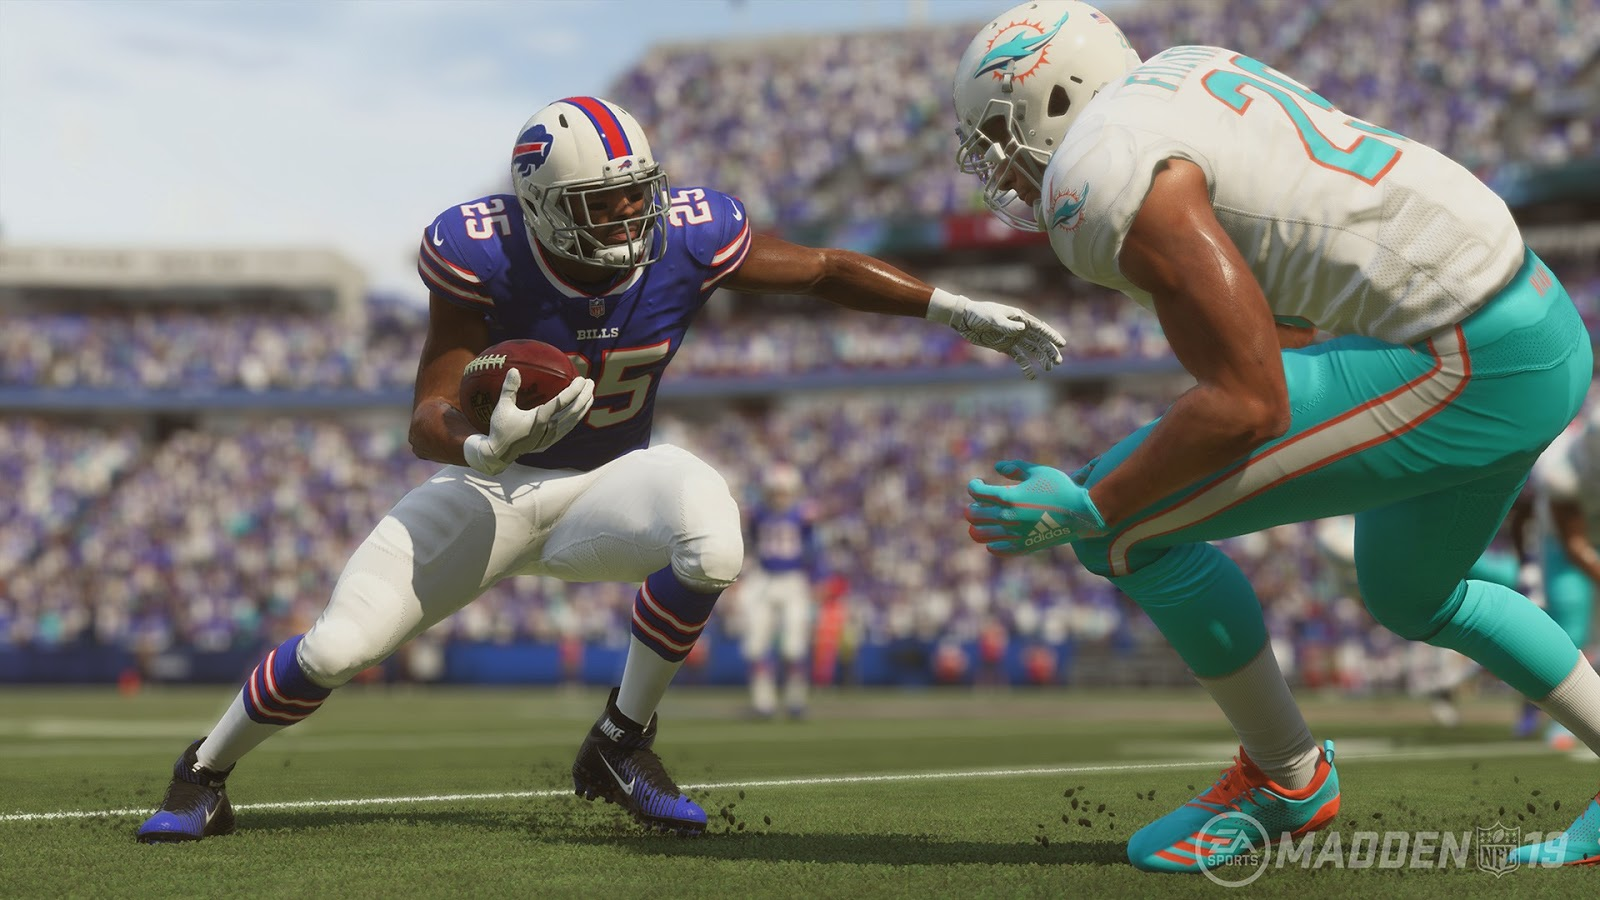 Madden NFL 19 PC (CODEX) 3